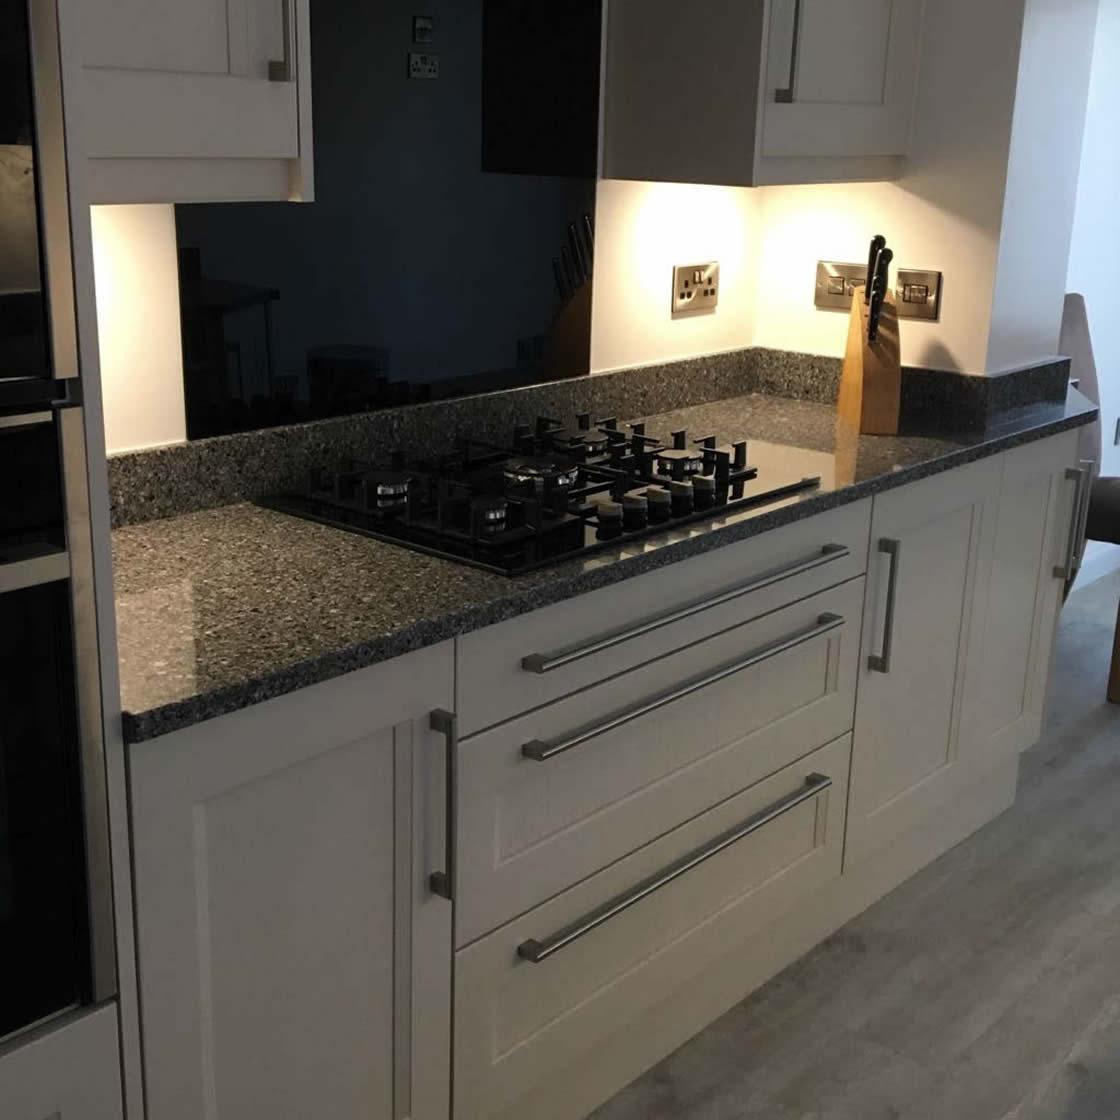 Bespoke Shaker Kitchen Design in Carshalton Beeches Surrey